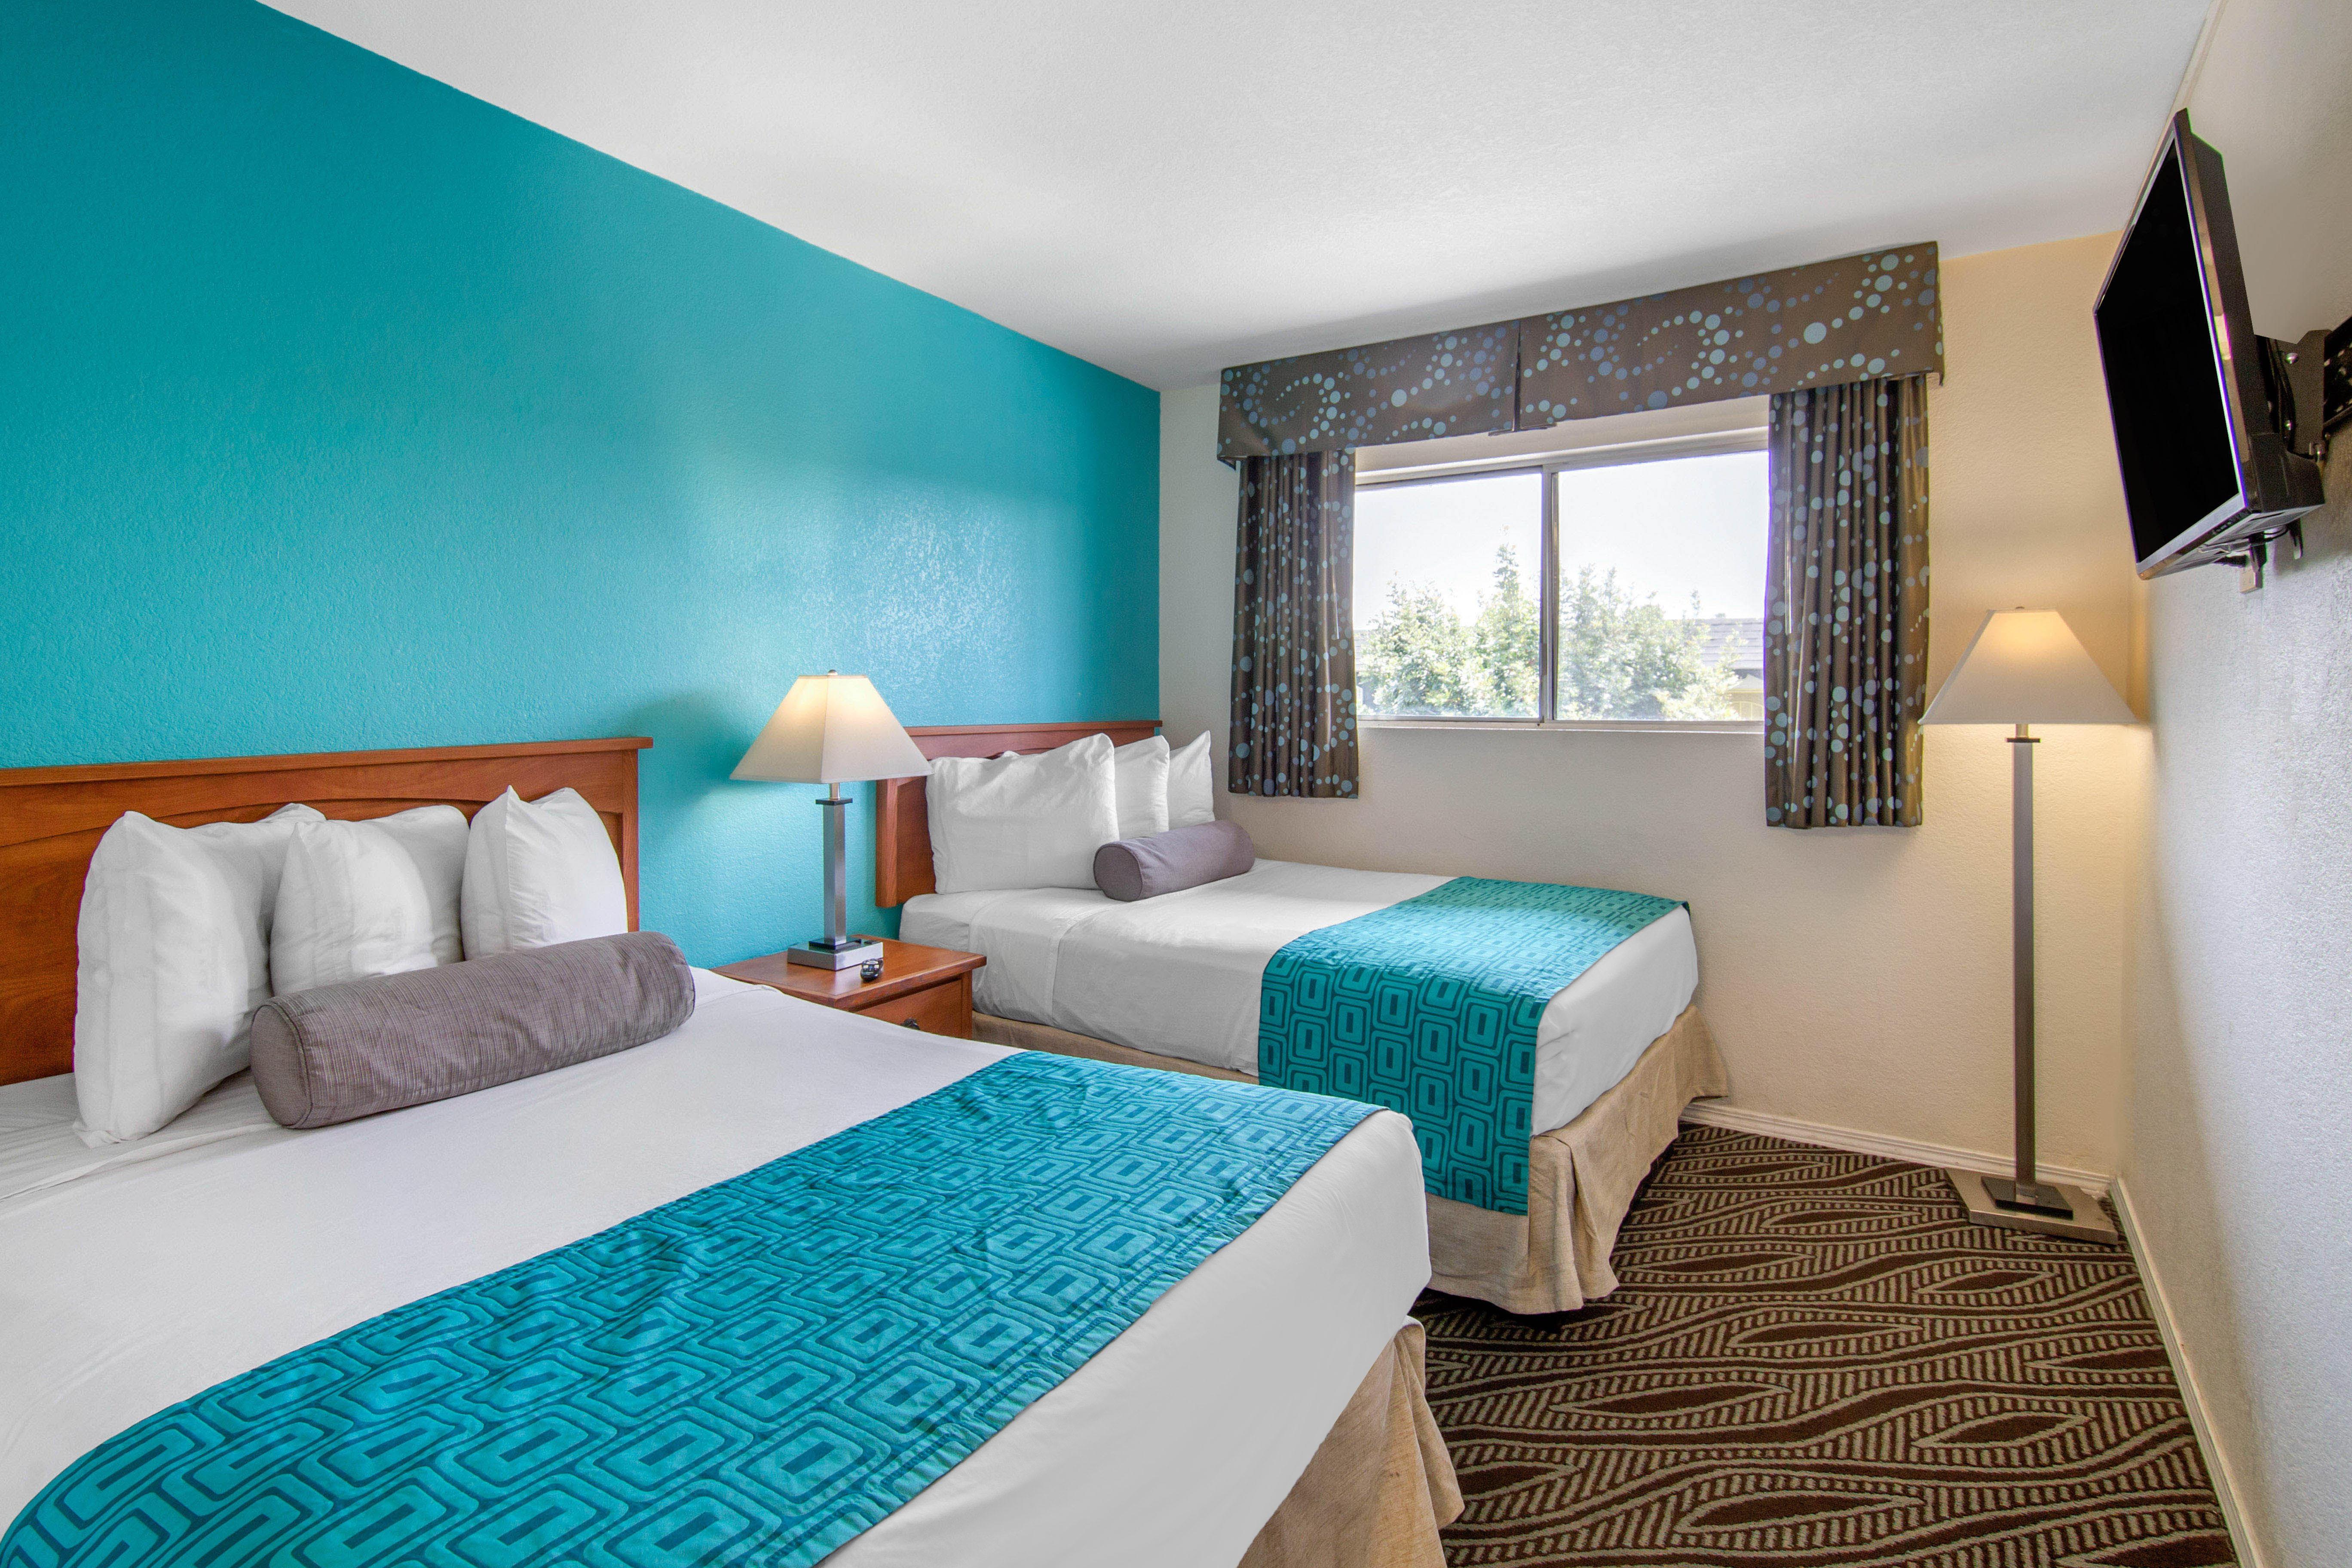 Howard Johnson by Wyndham Chula Vista San Diego Suite Hotel image 9